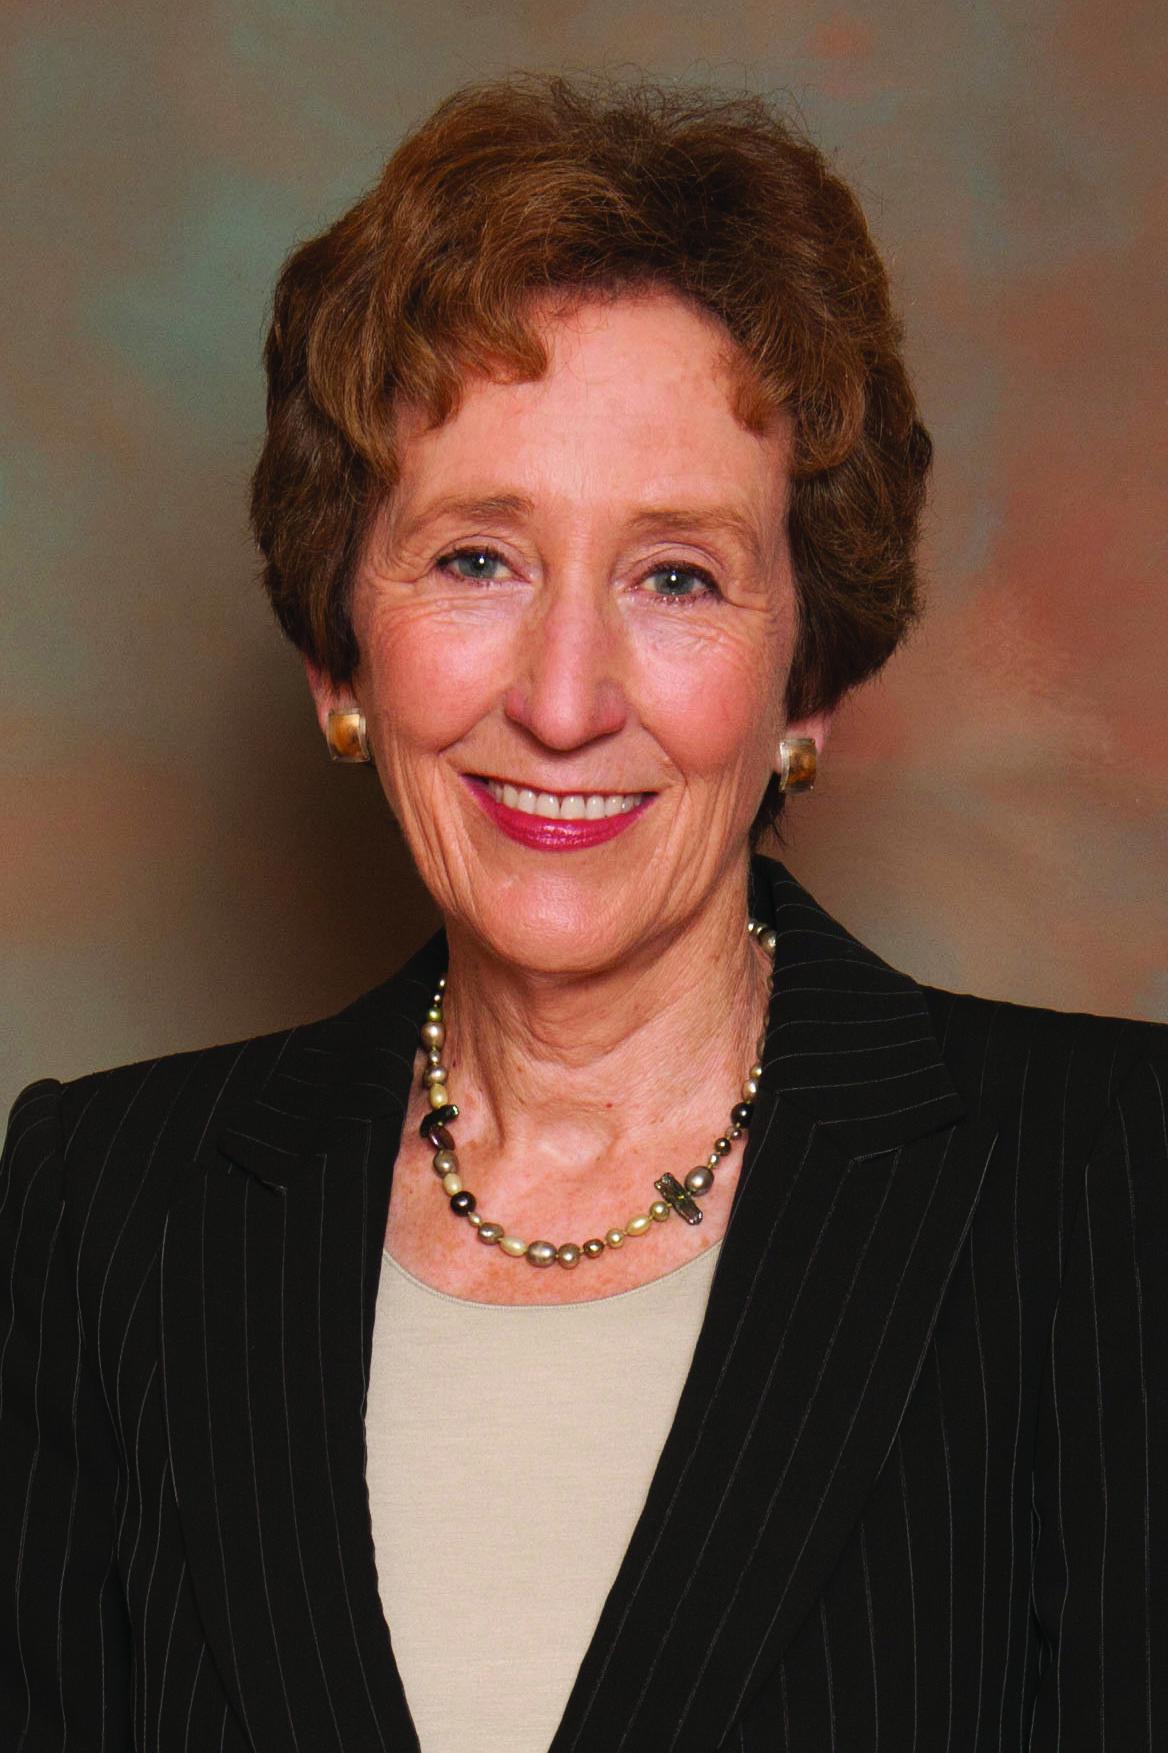 Dr. Suzanne Shipley, Shepherd's 15th president.